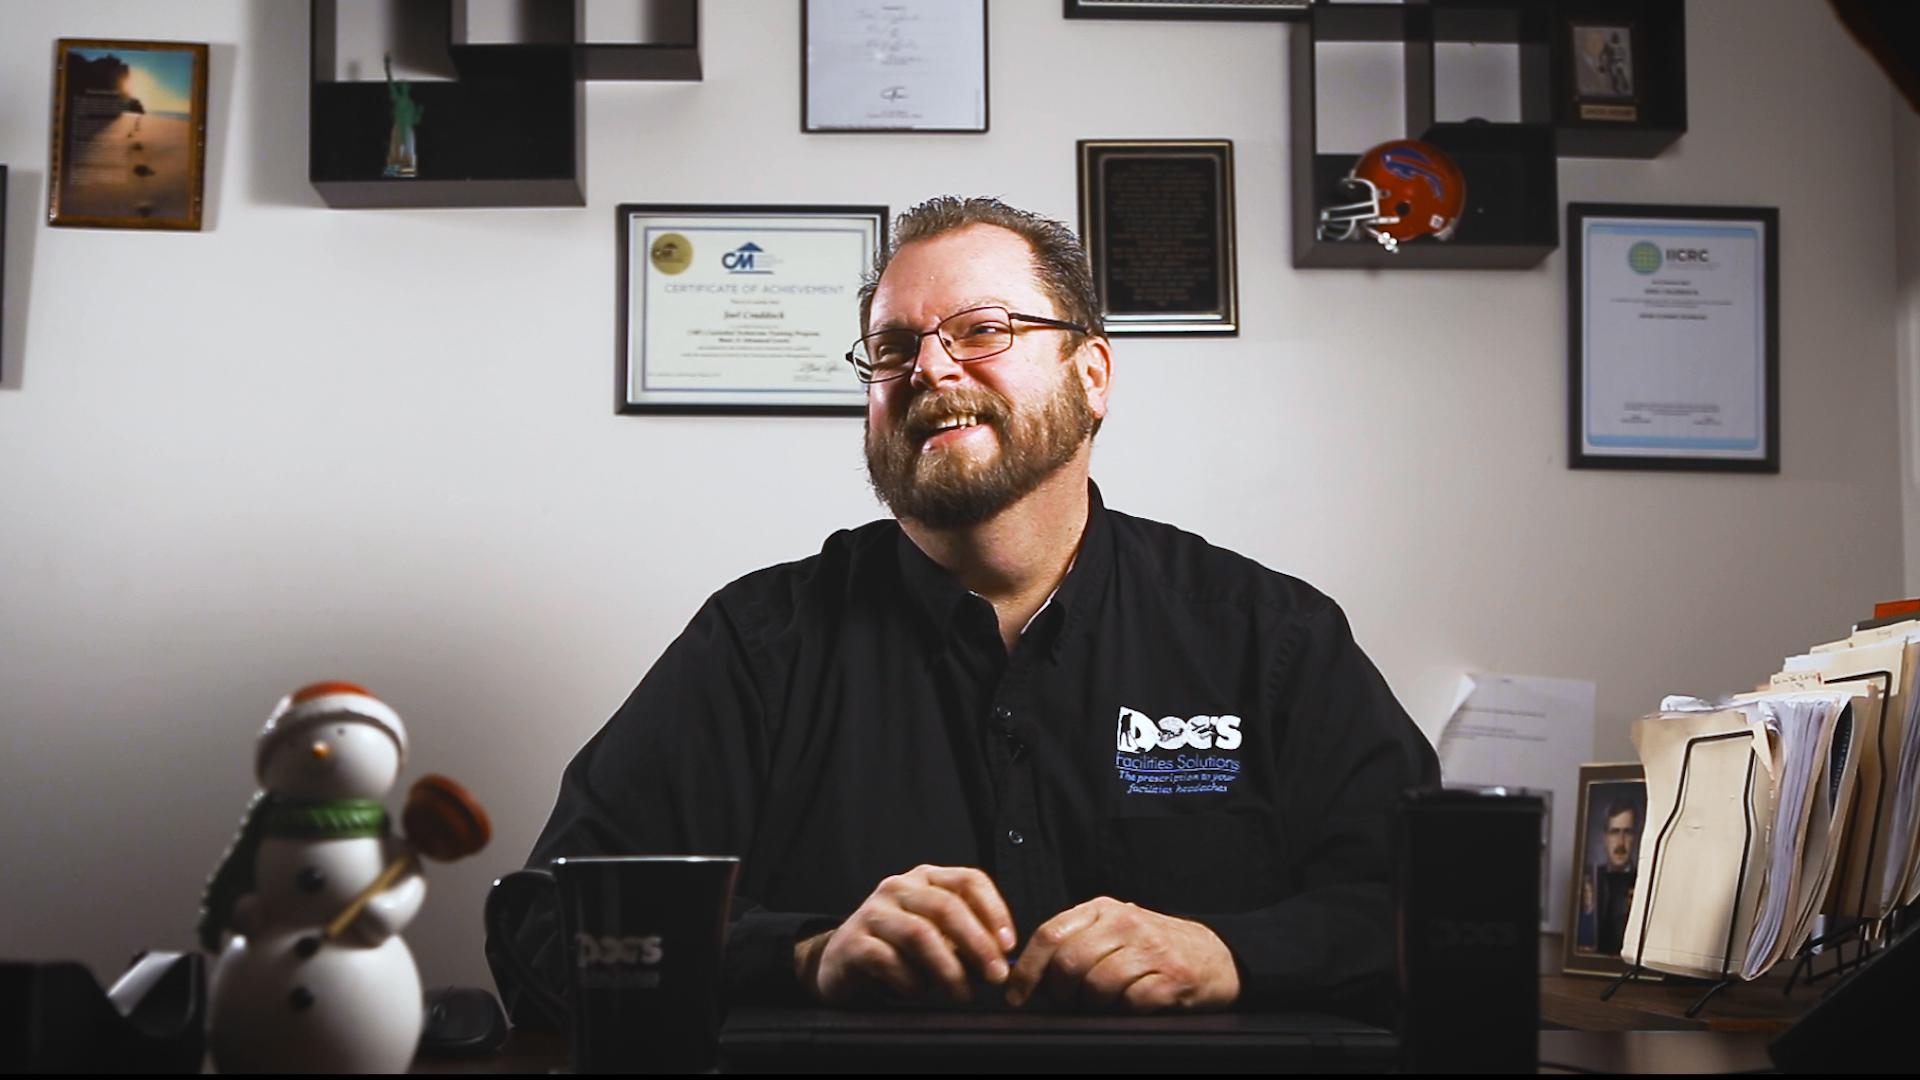 Testimonial_Joel Craddock - Docs Facilities Solutions_FINAL_v2